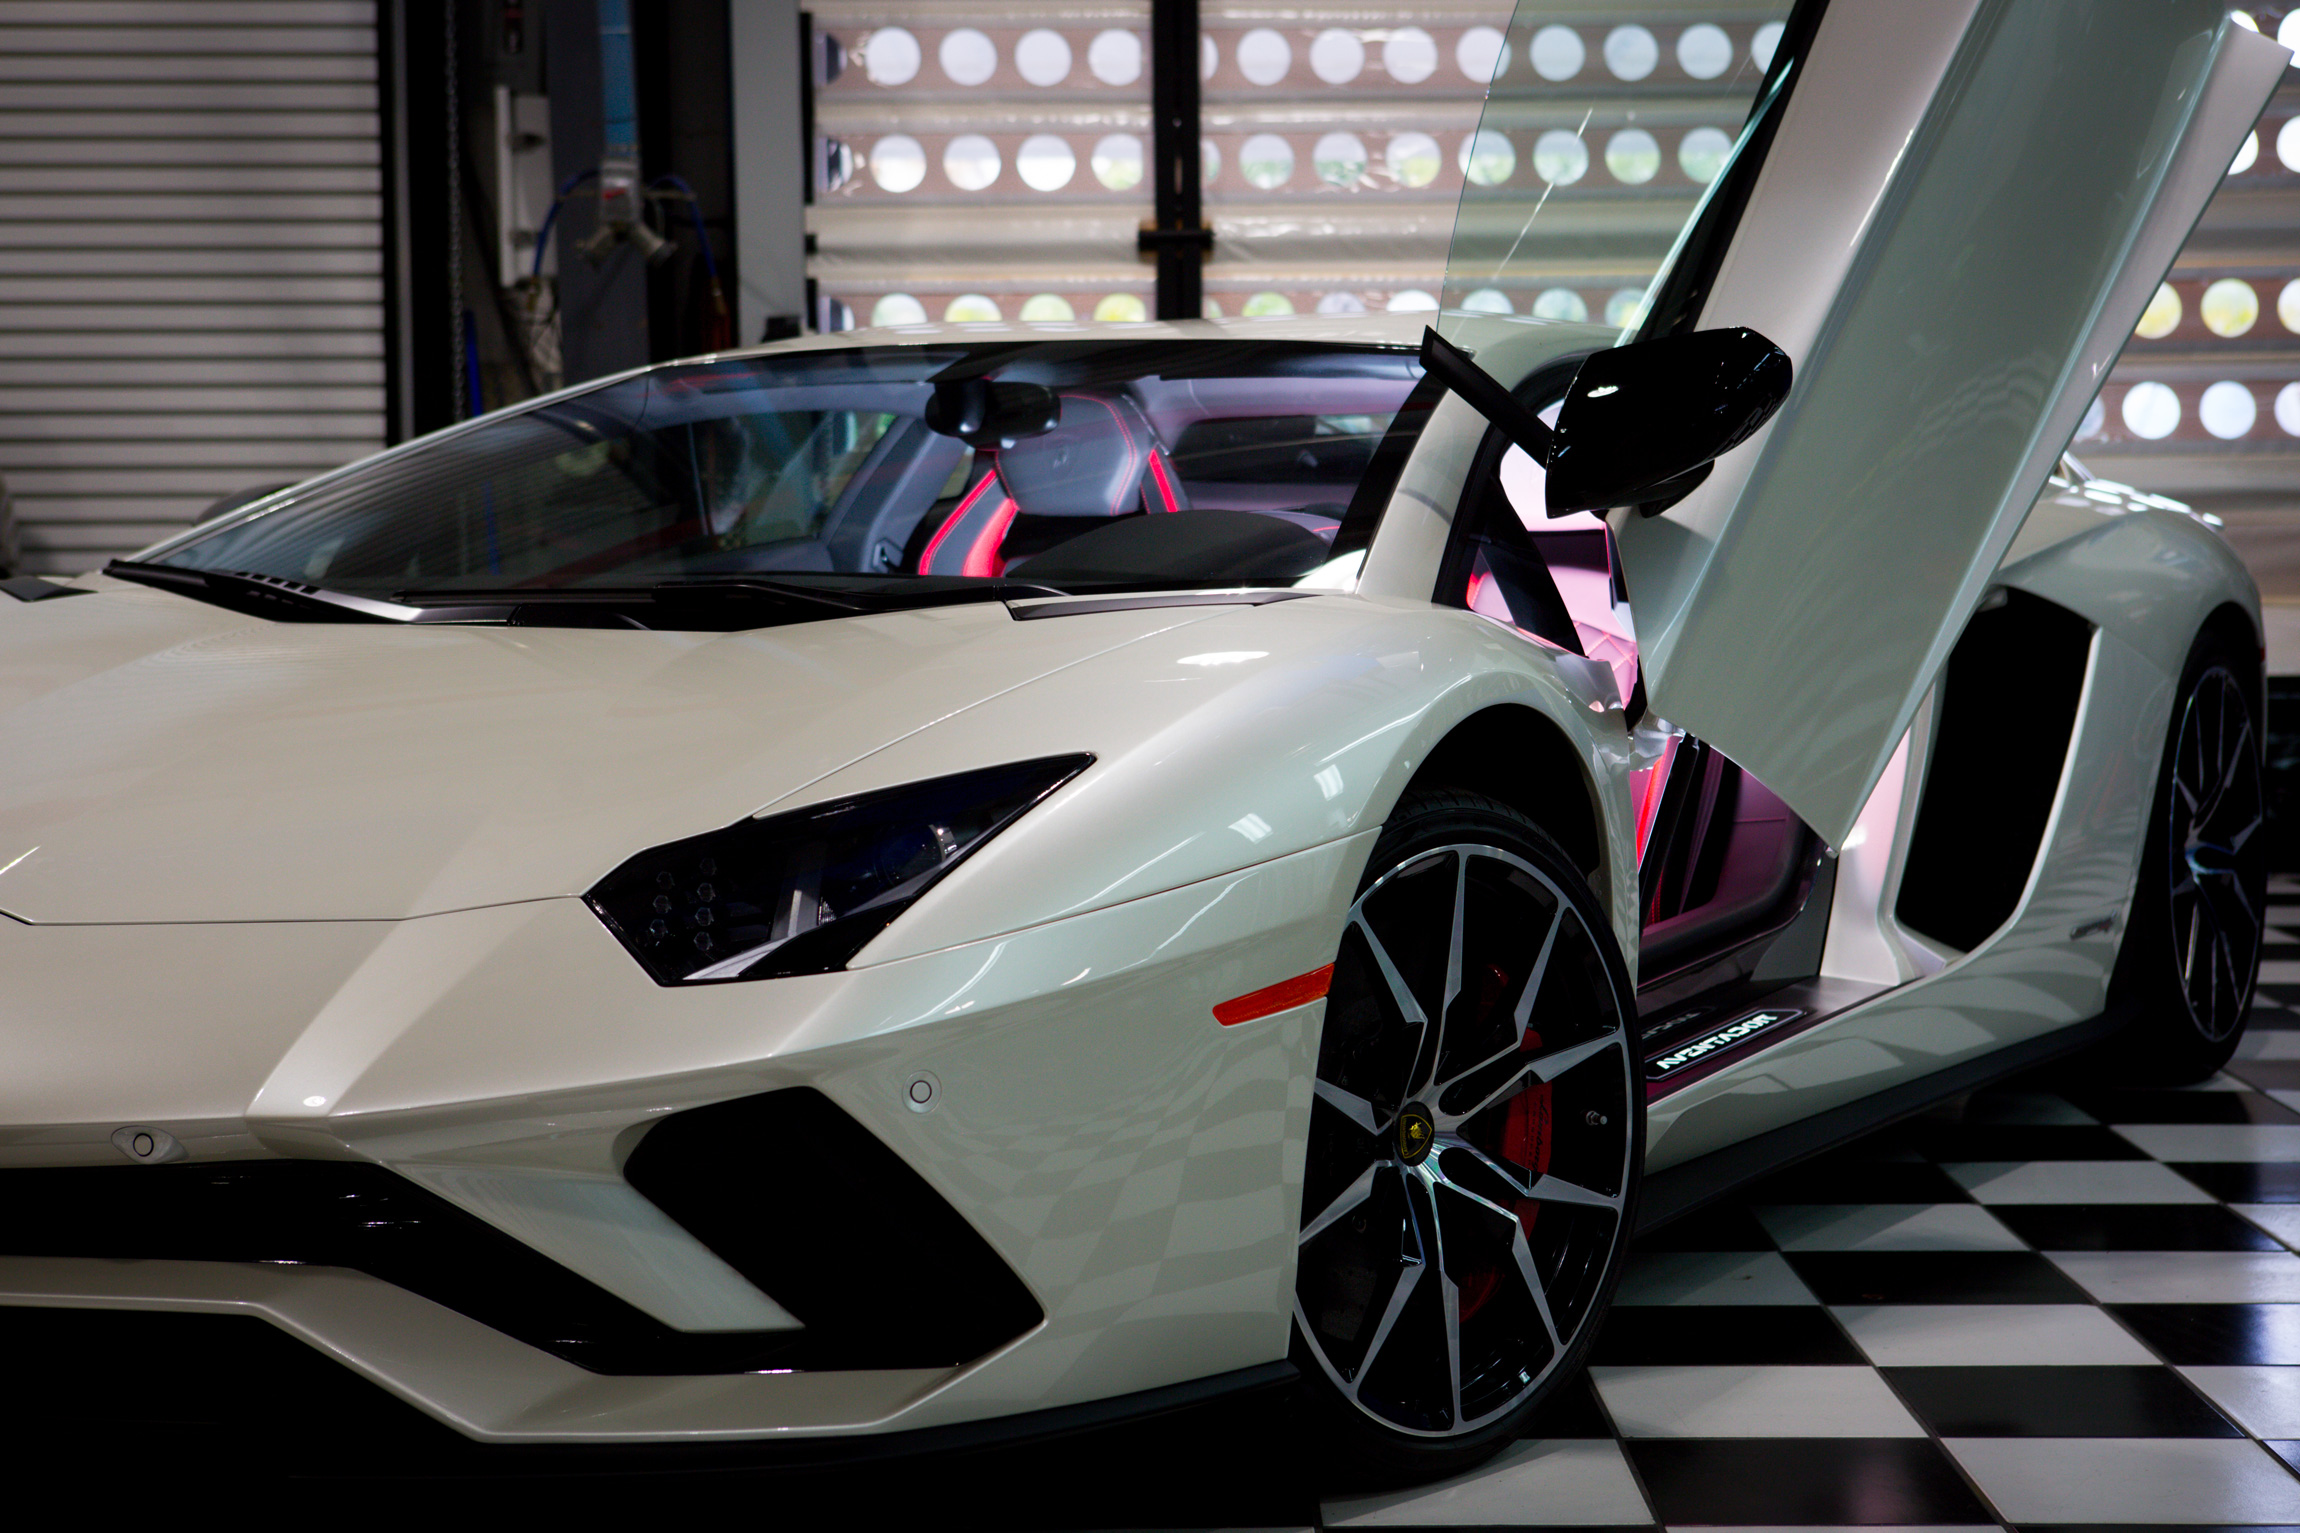 lamborghini for aventador price in cars united lauderdale states sale fl ft